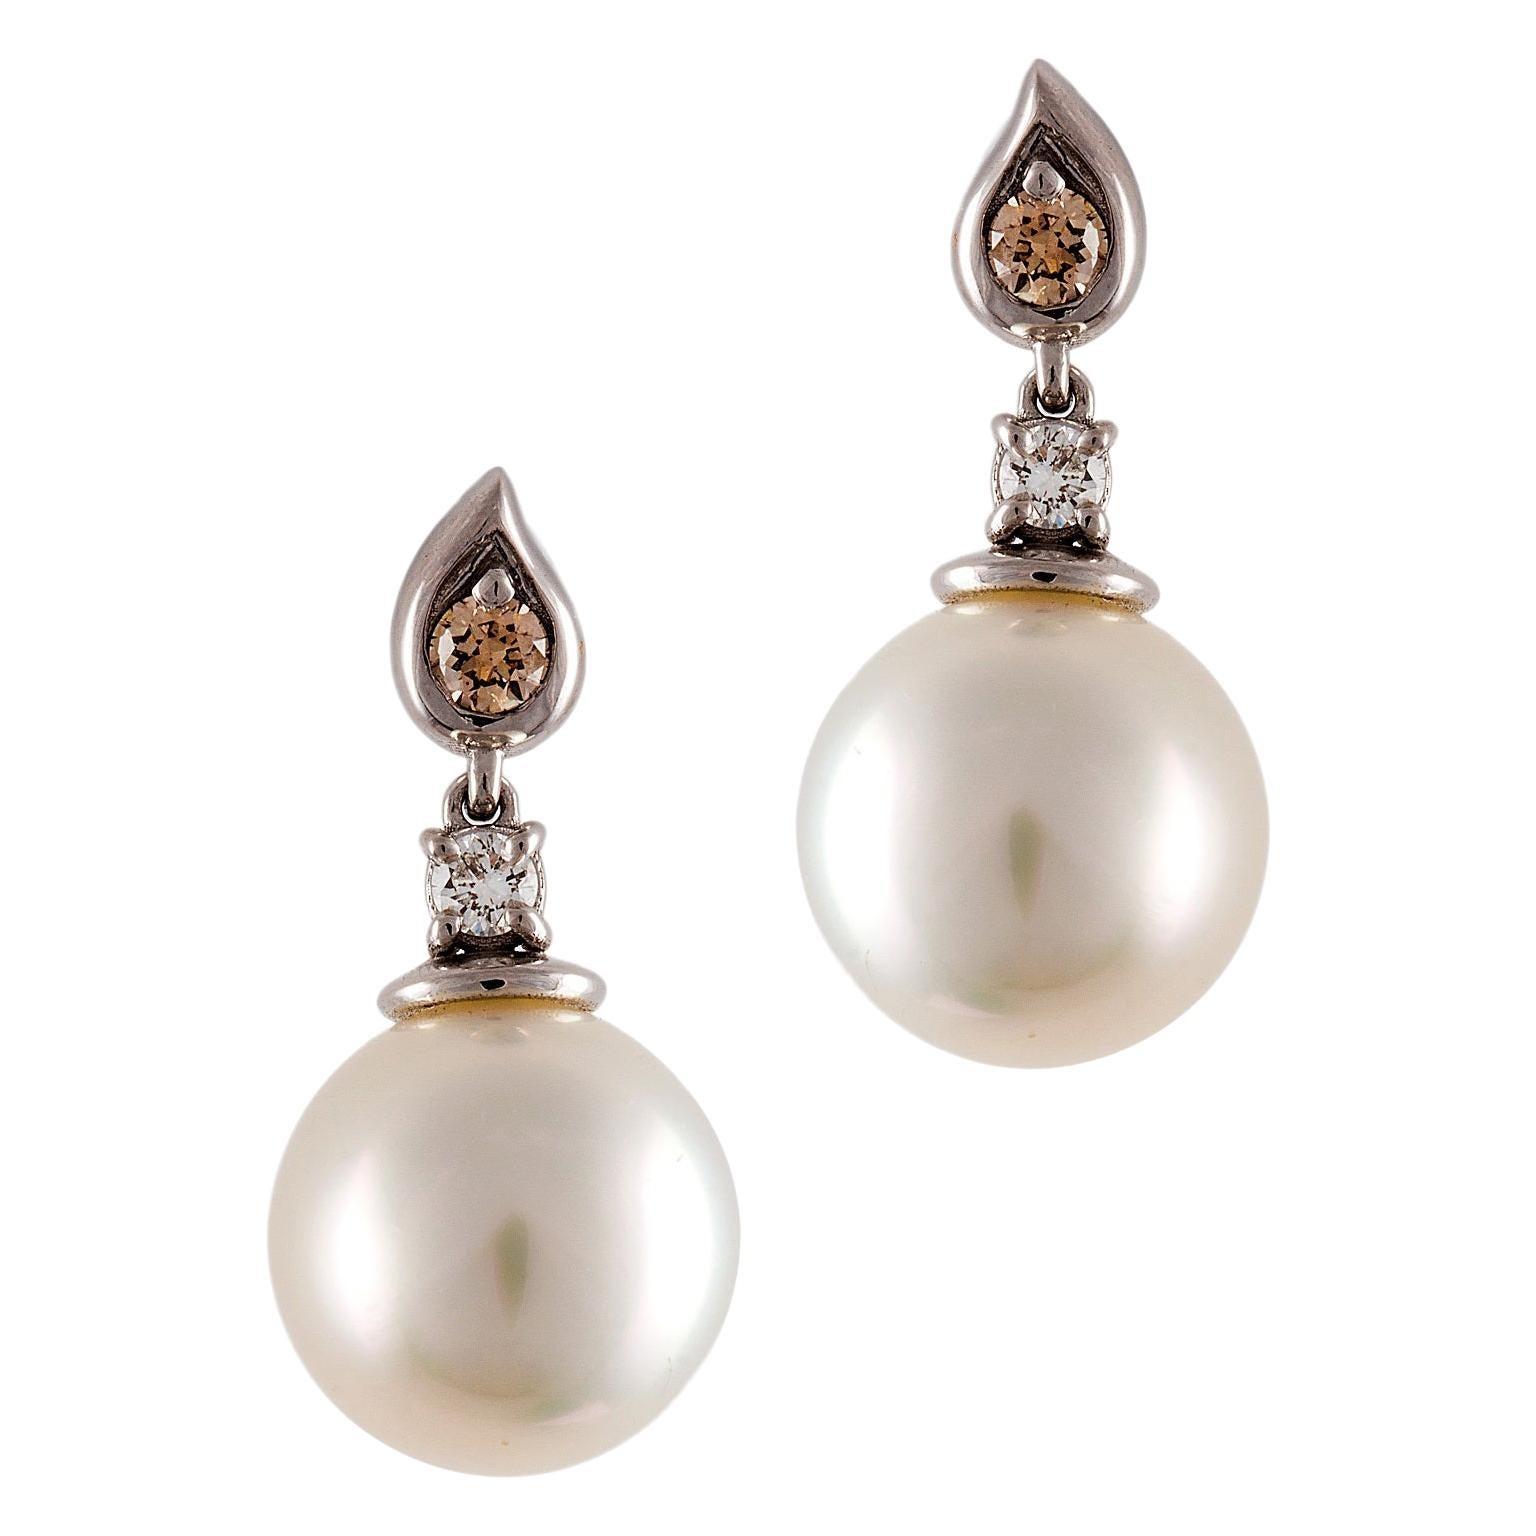 Kian Design South Sea Pearl and Diamond Drop Earrings in 18 Carat White Gold